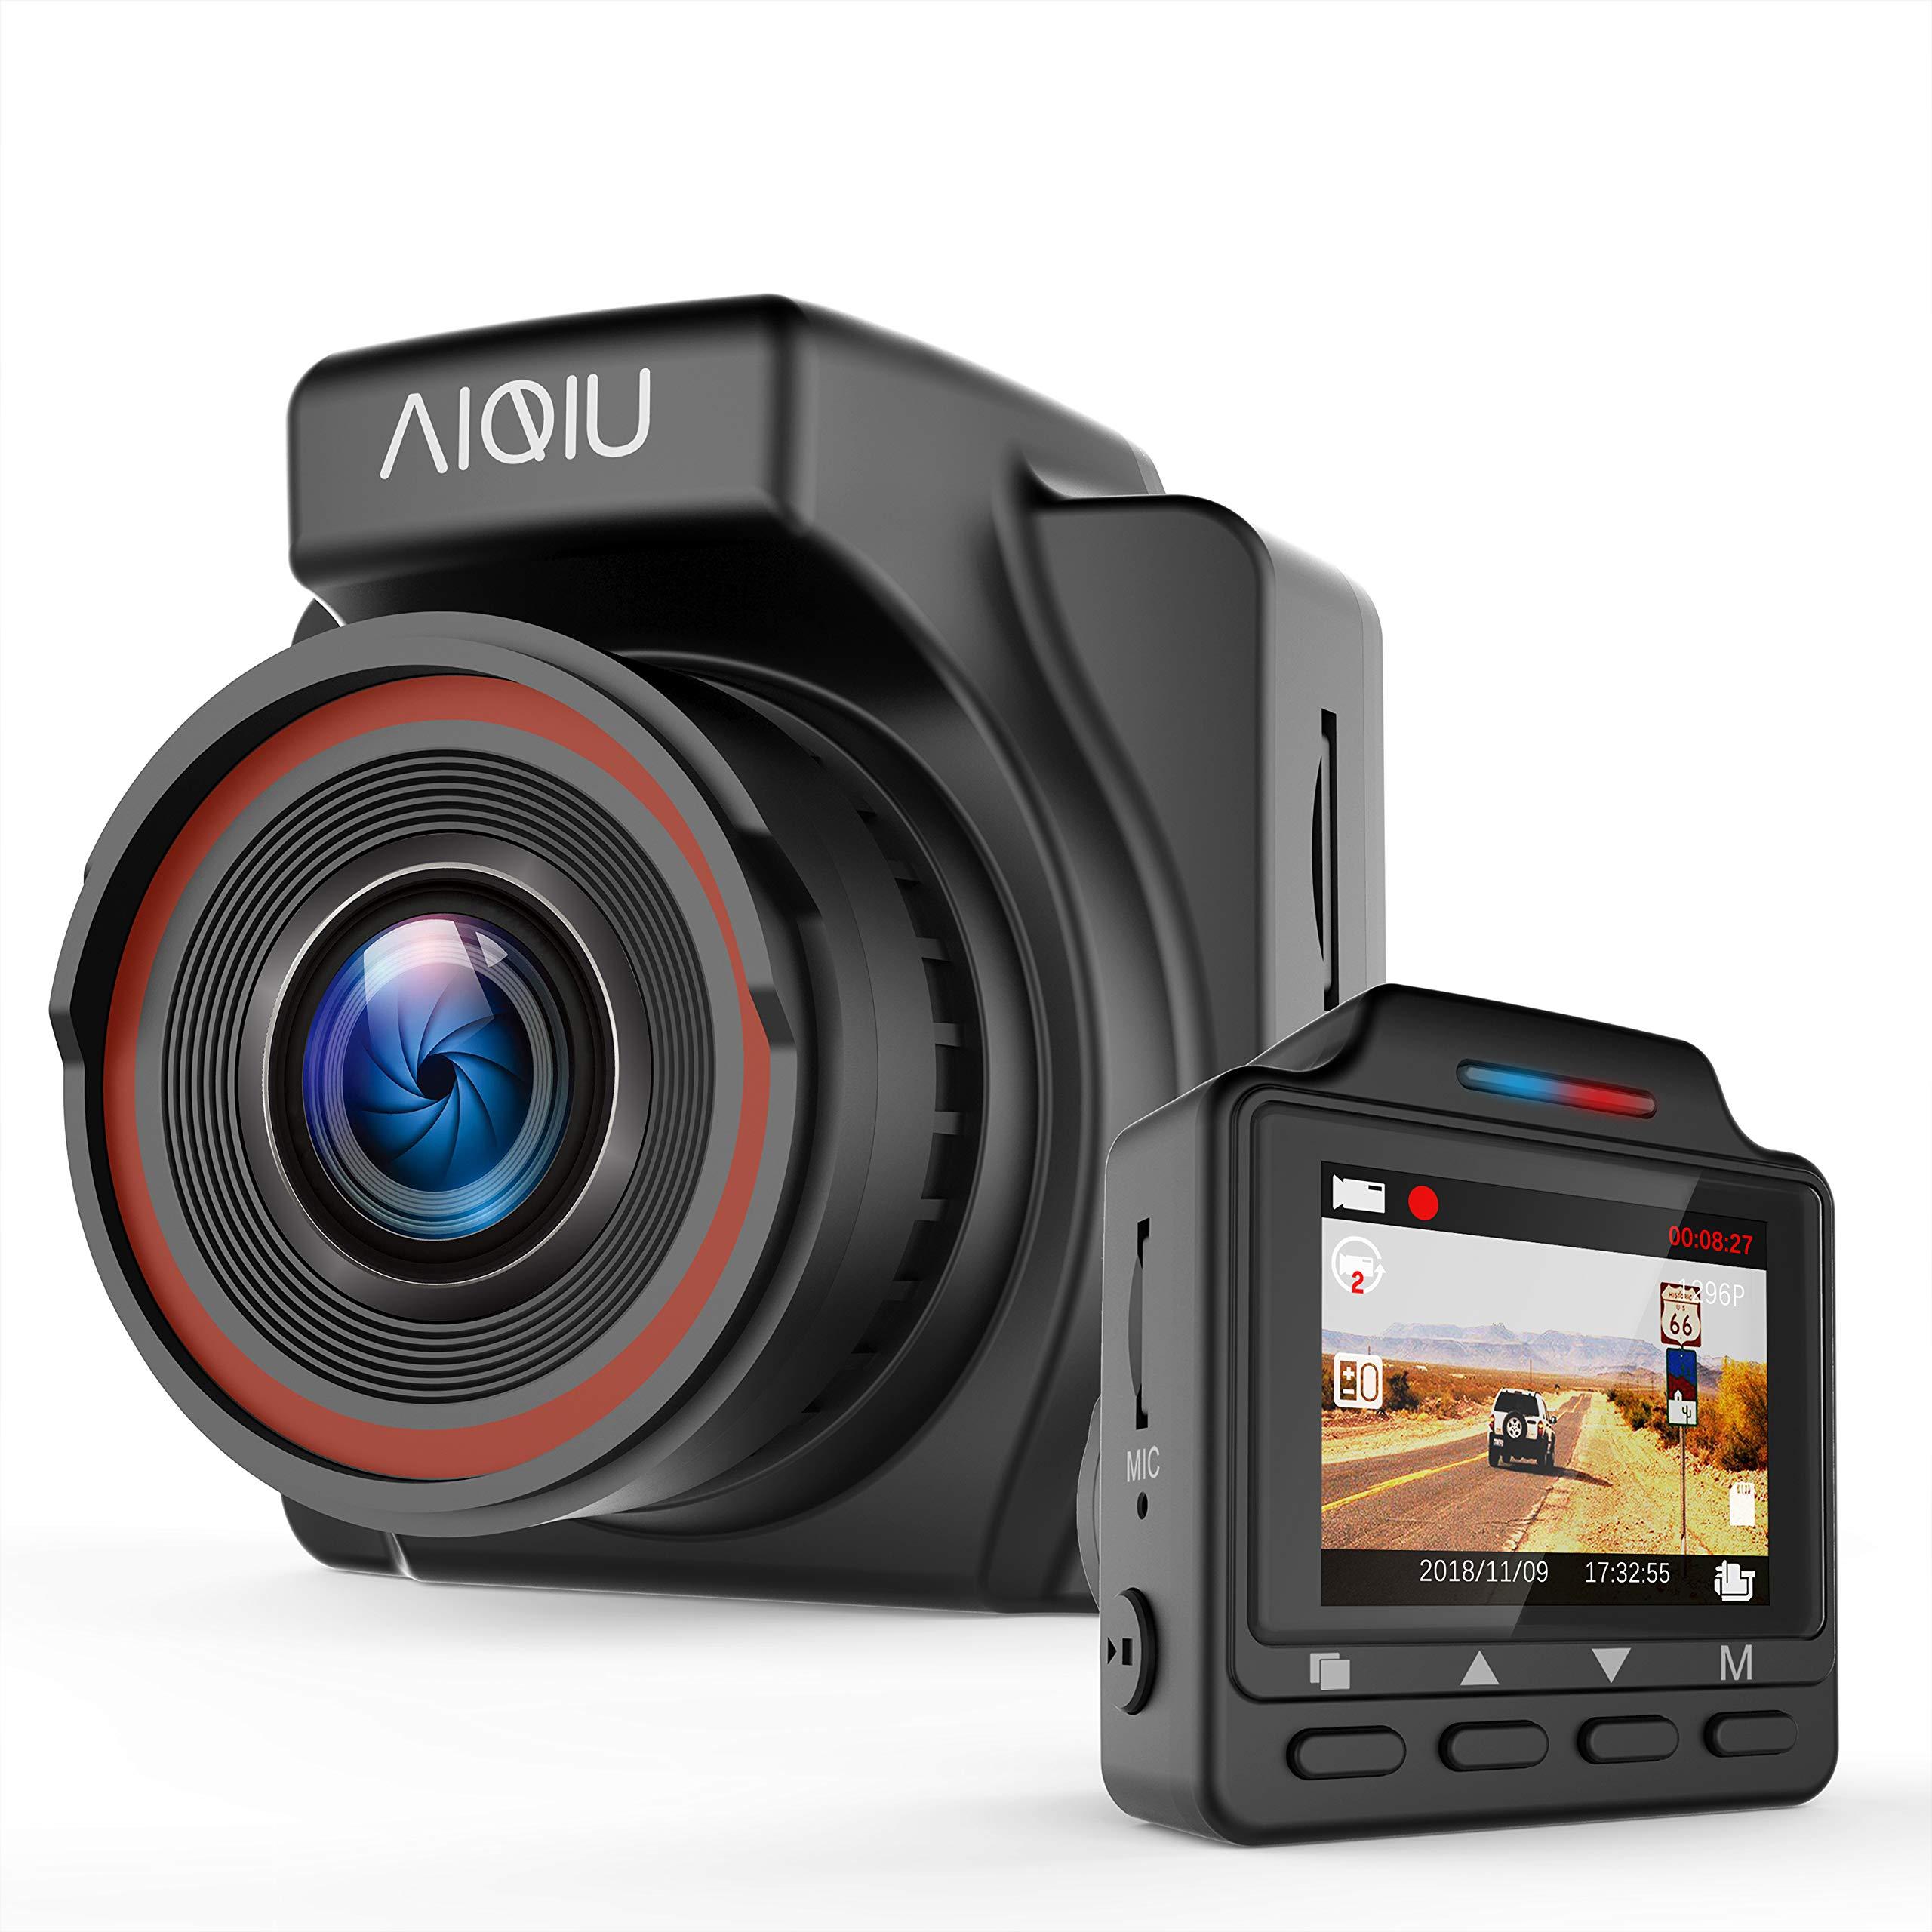 "AIQiu AM000C1 Dash Cam, 1296P FHD Car Driving Recorder 1.5"" Mini Night Vision Vehicle Dashboard Camera with G - Sensor, Black"